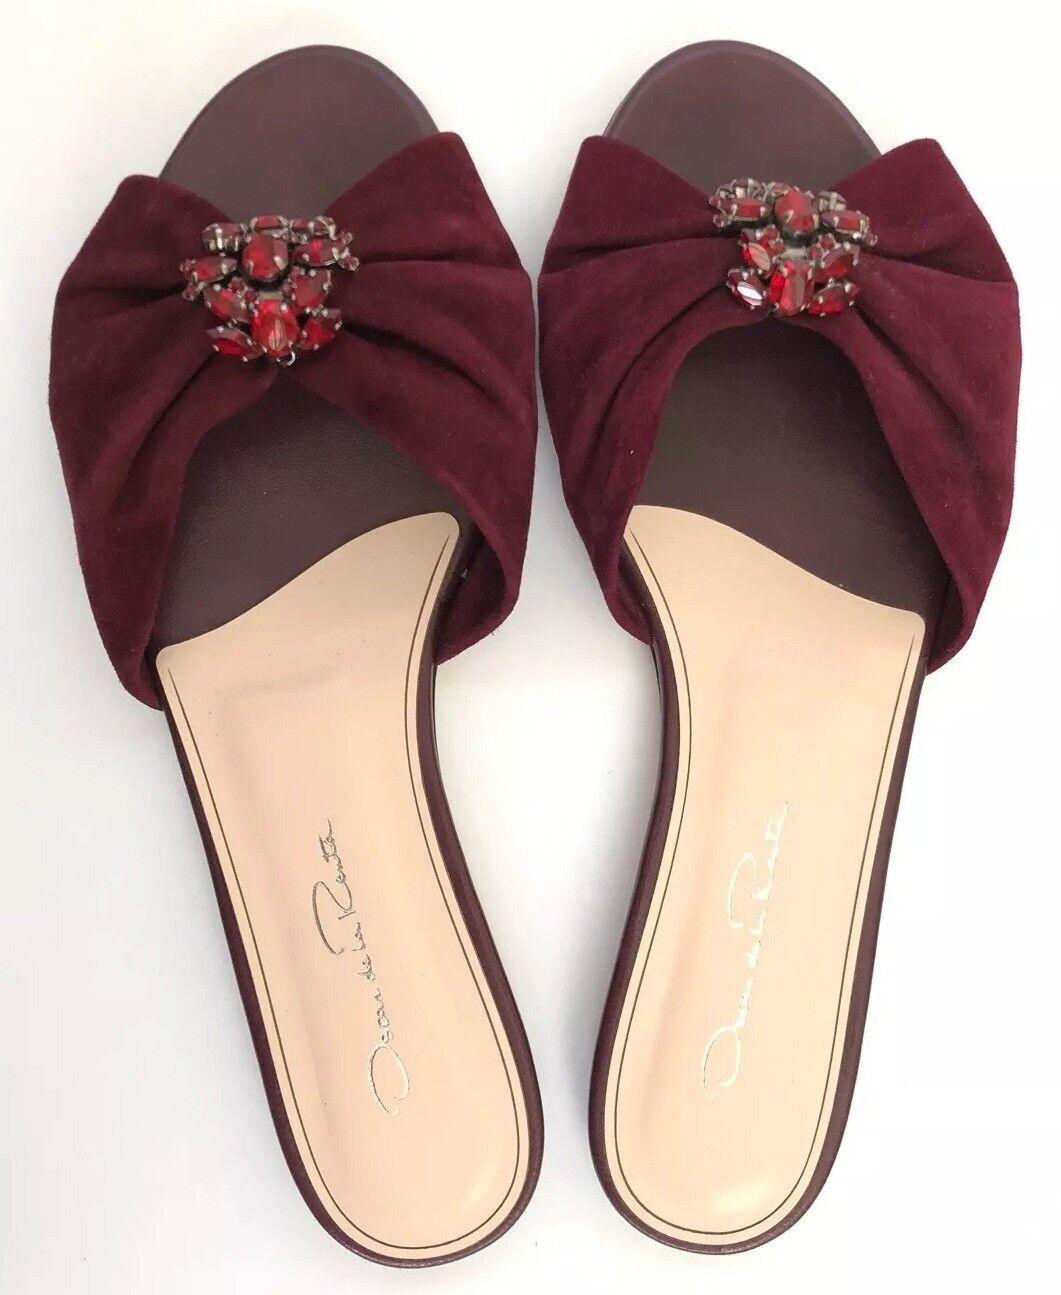 Oscar de la Renta Femmes Chaussures Taille 37 NEW IN BOX Flip Flop Bourgogne